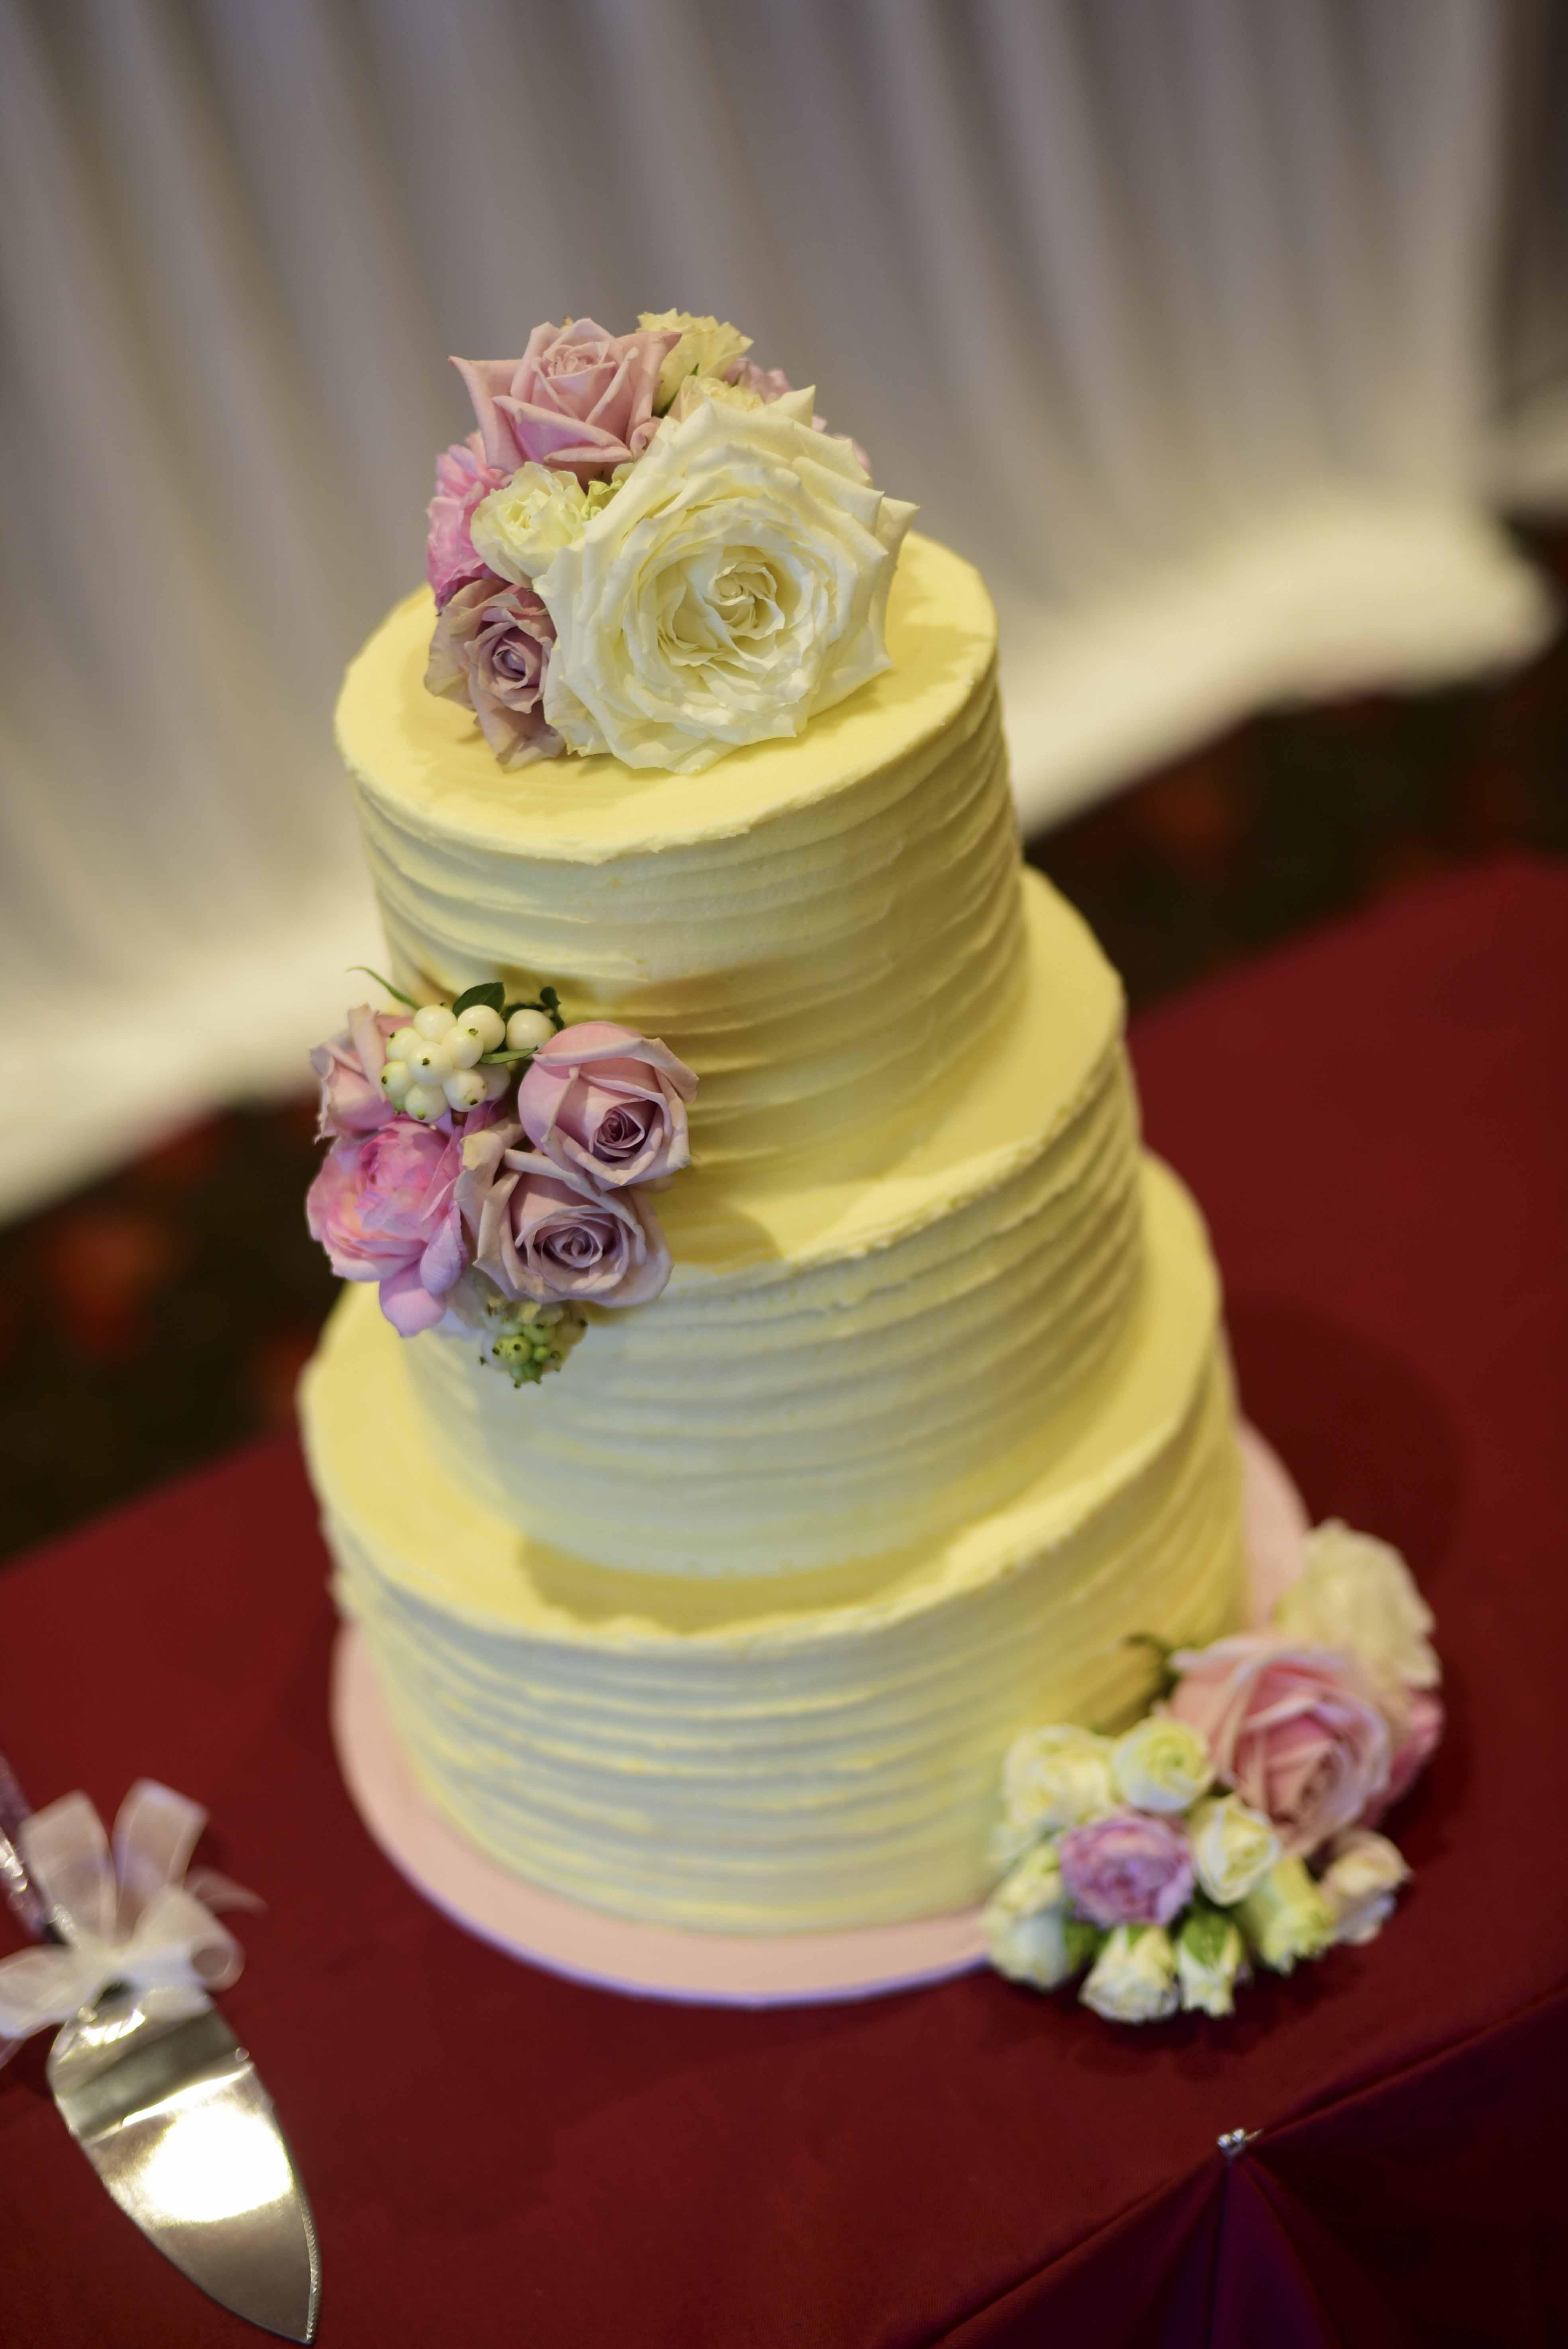 Buttercream Wedding Cake $550 • Temptation Cakes | Temptation Cakes